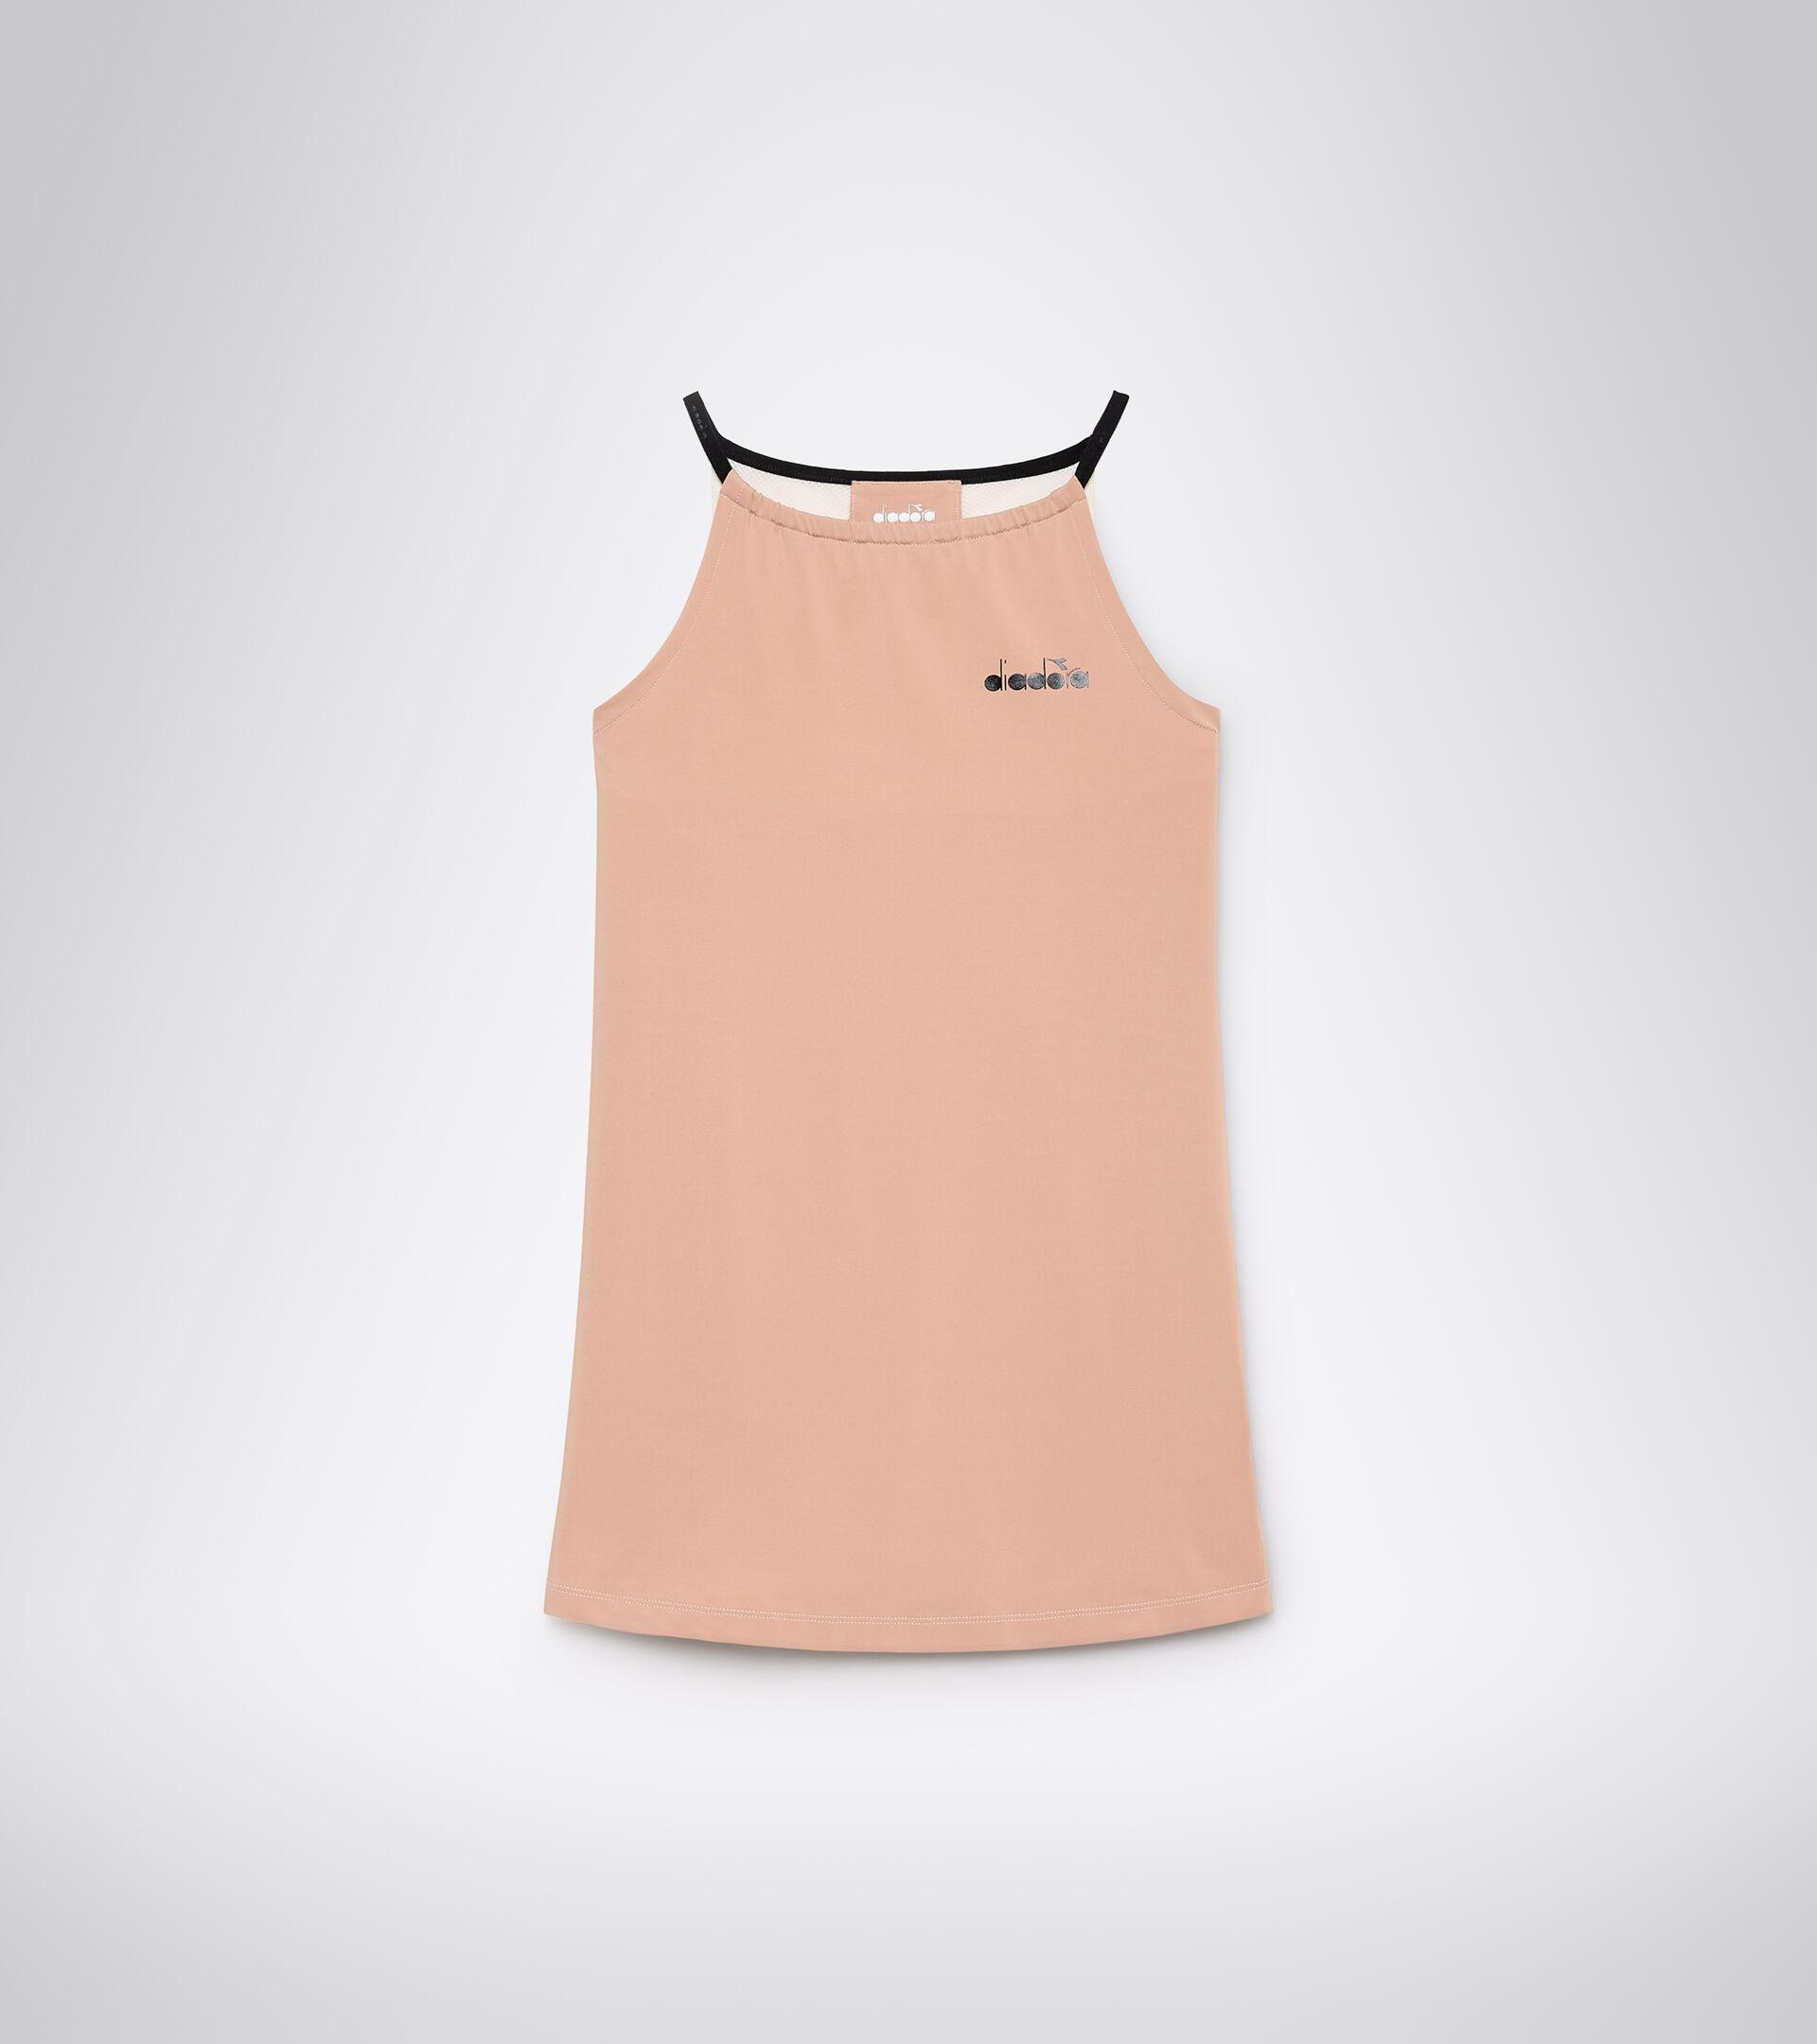 Apparel Sport DONNA L. DRESS CLAY MAHOGANY ROSE/WHISPER WHITE Diadora